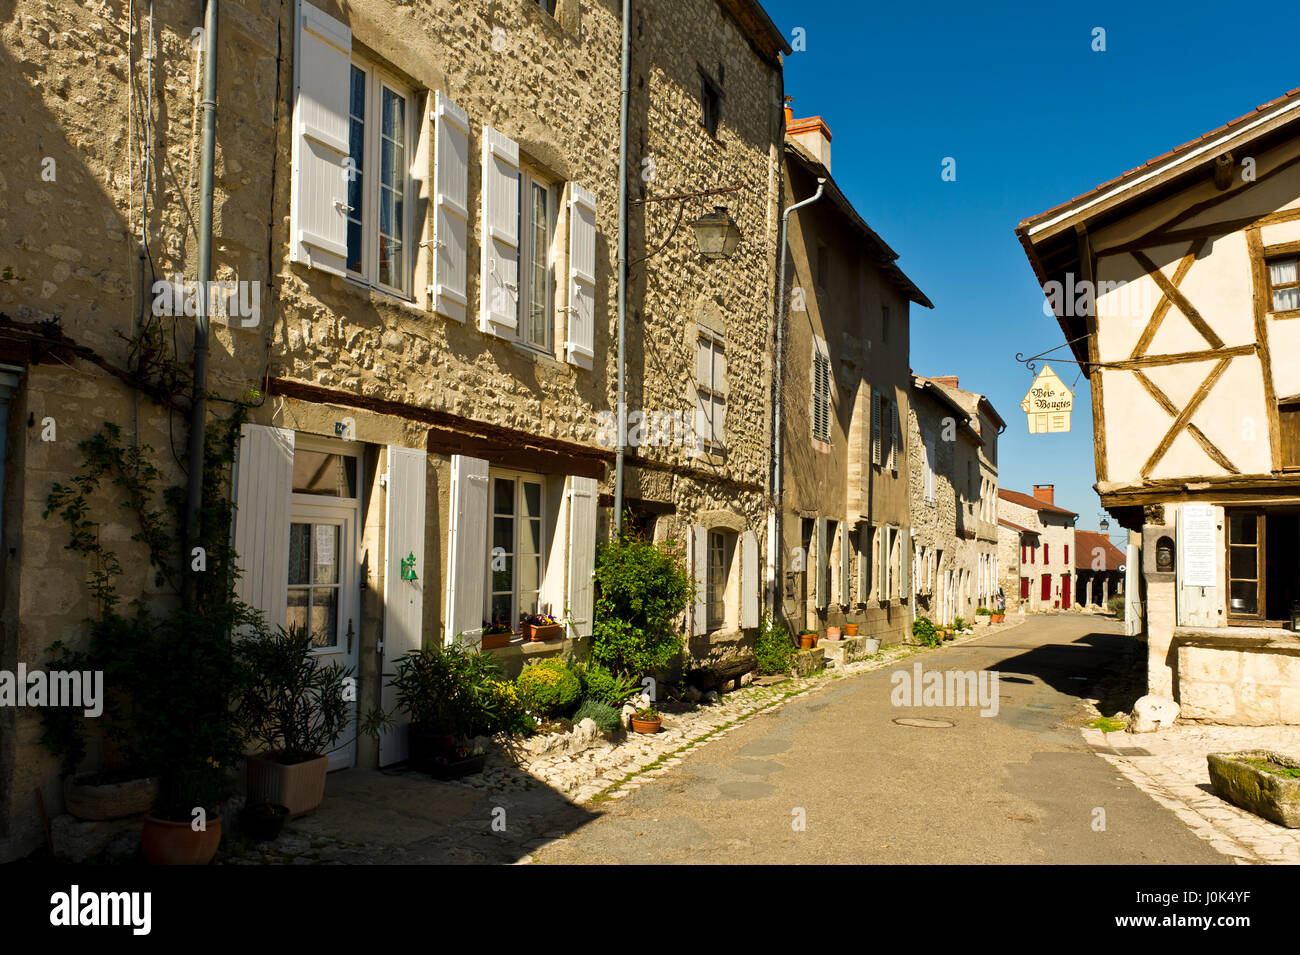 Old Buildings  Charroux  Allier  Auvergne  France Stock Photo  138103939